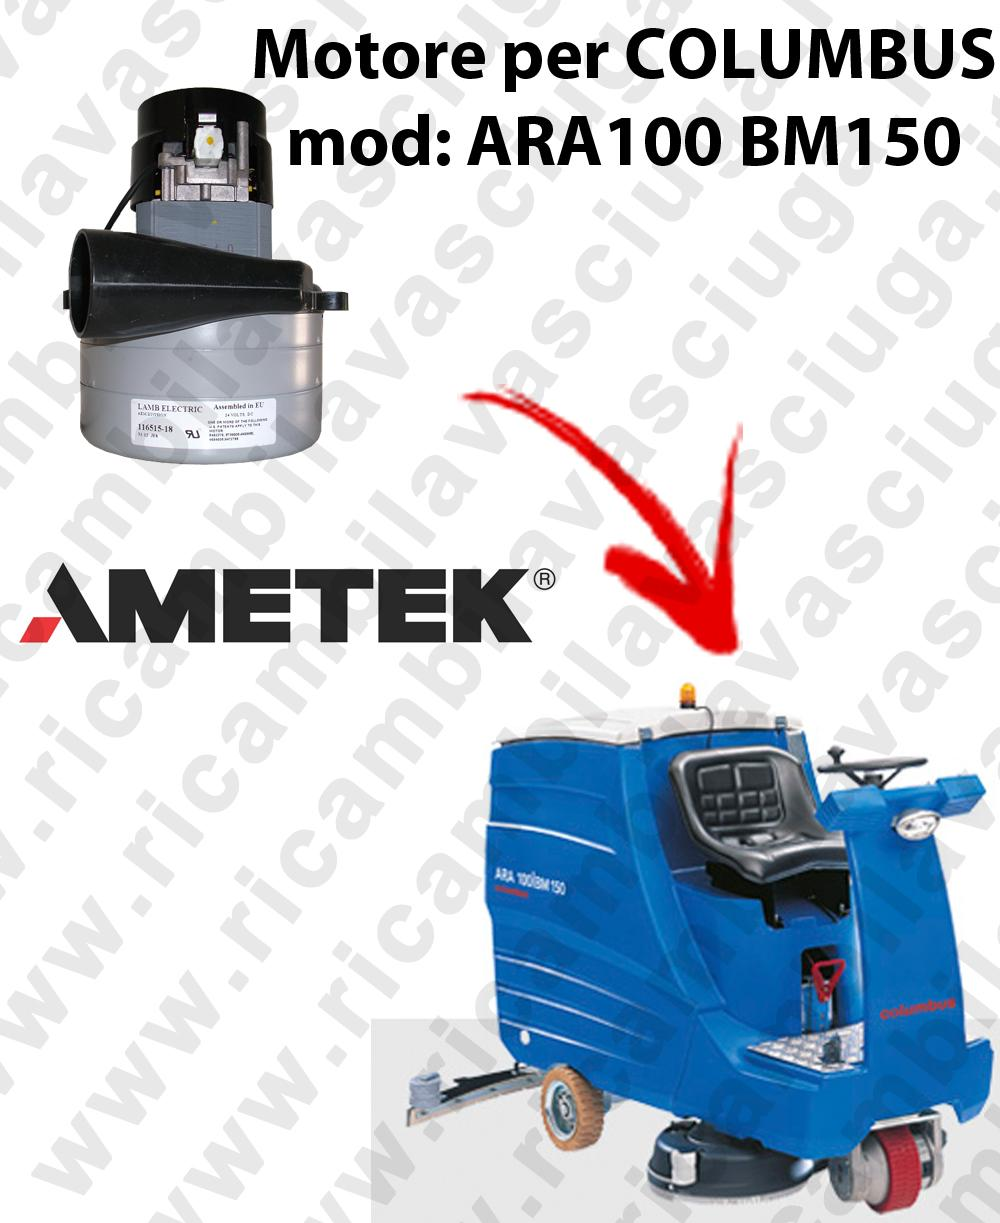 ARA100 BM150 Saugmotor LAMB AMETEK für scheuersaugmaschinen COLUMBUS